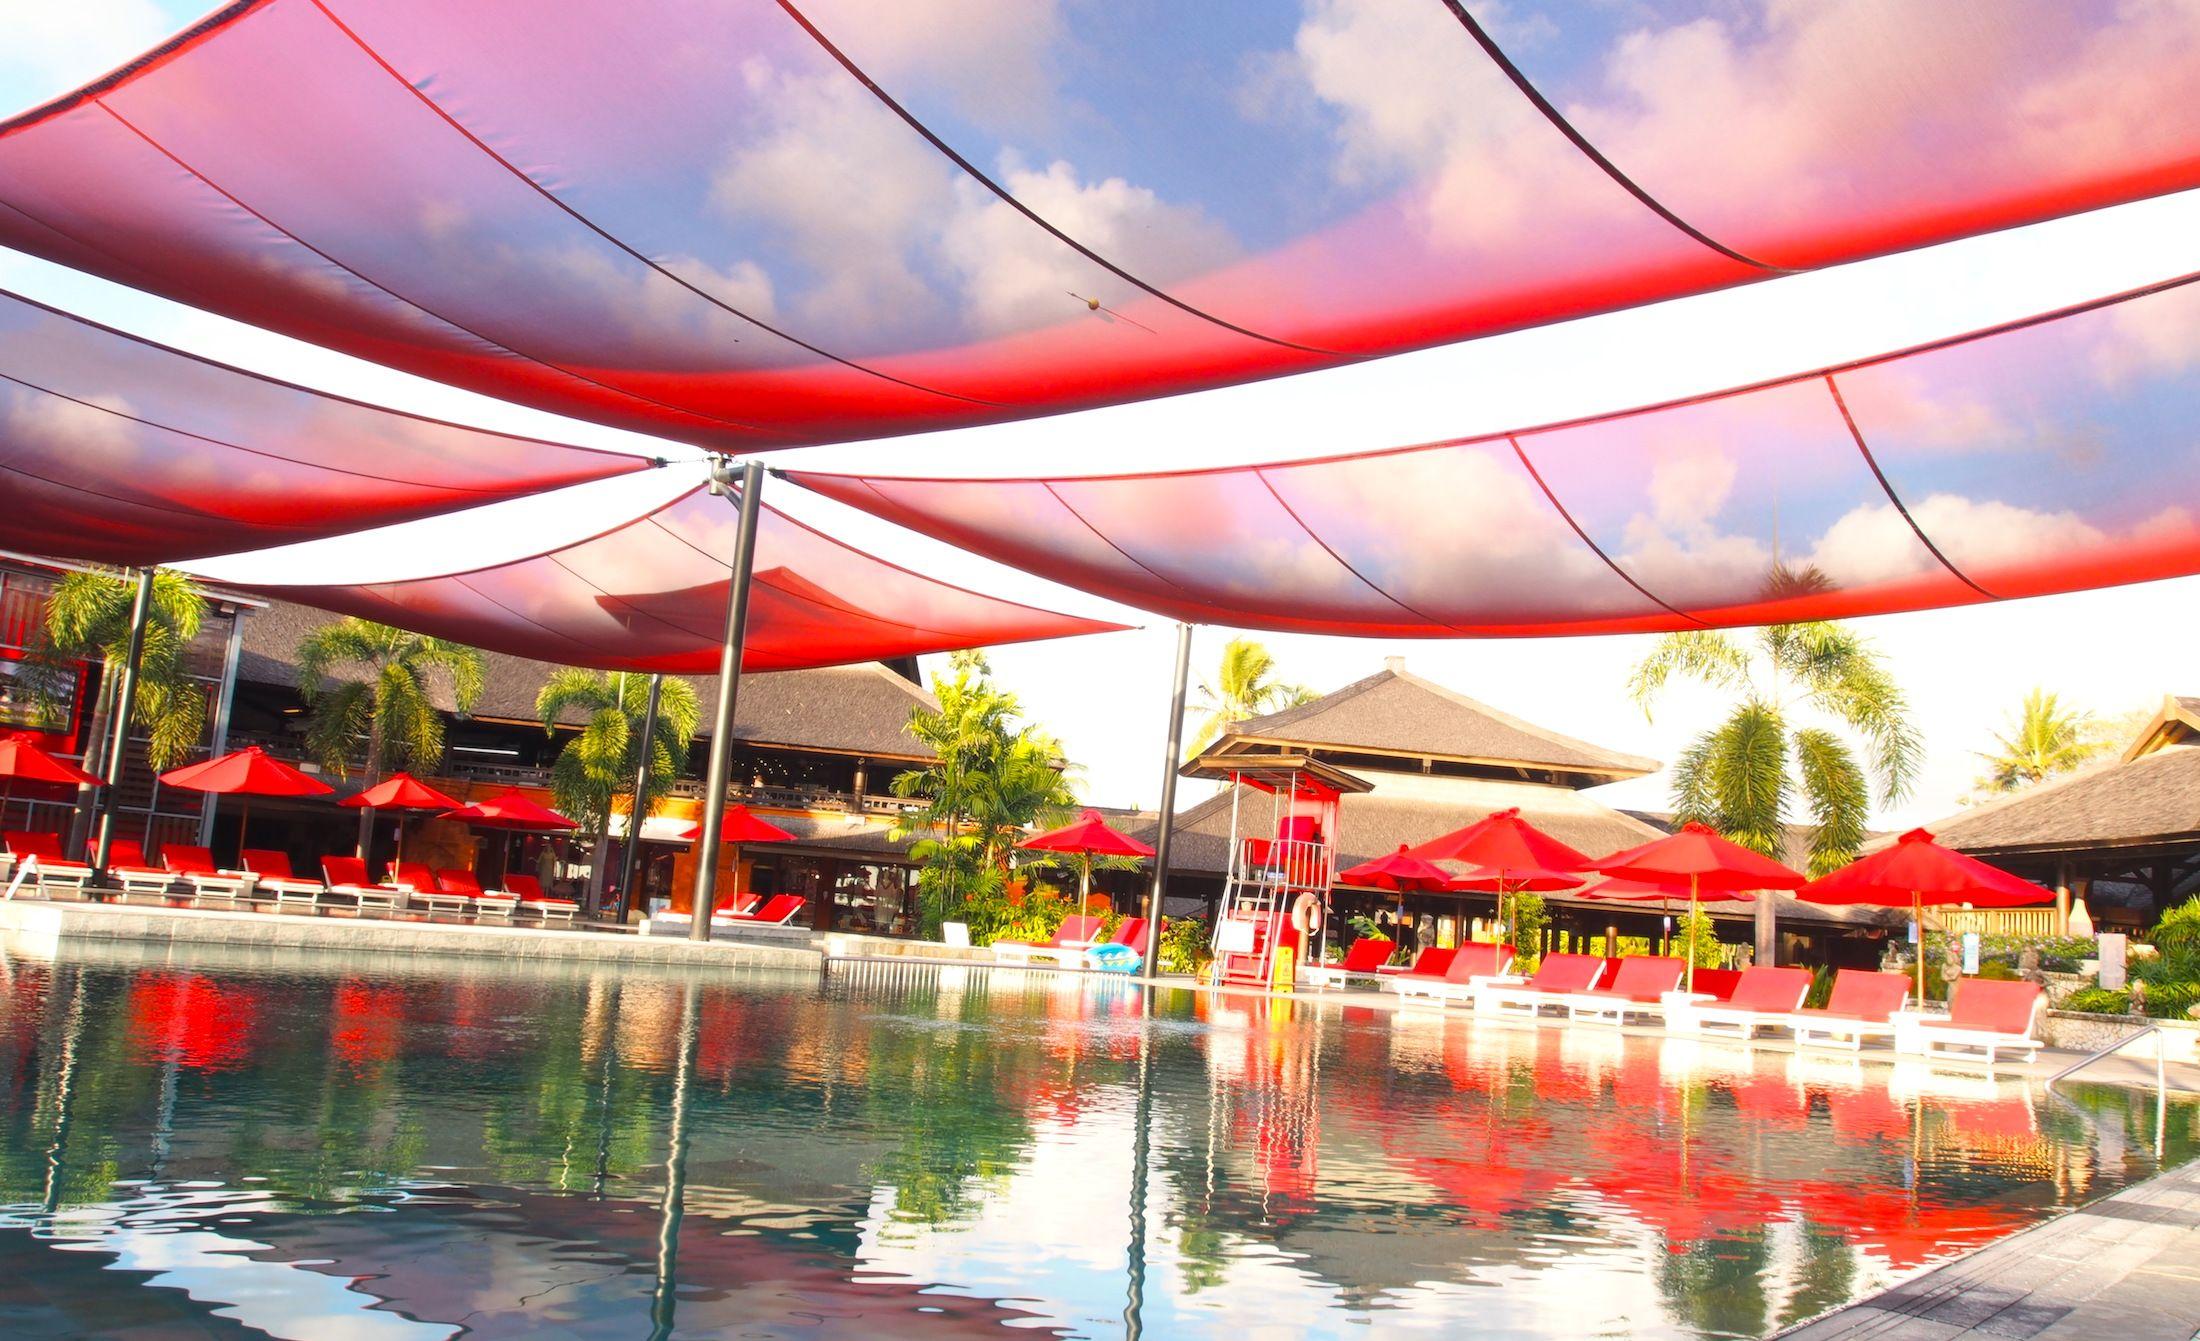 「Club Med Bali(クラブメッドバリ)」のロケーション写真、プールの画像